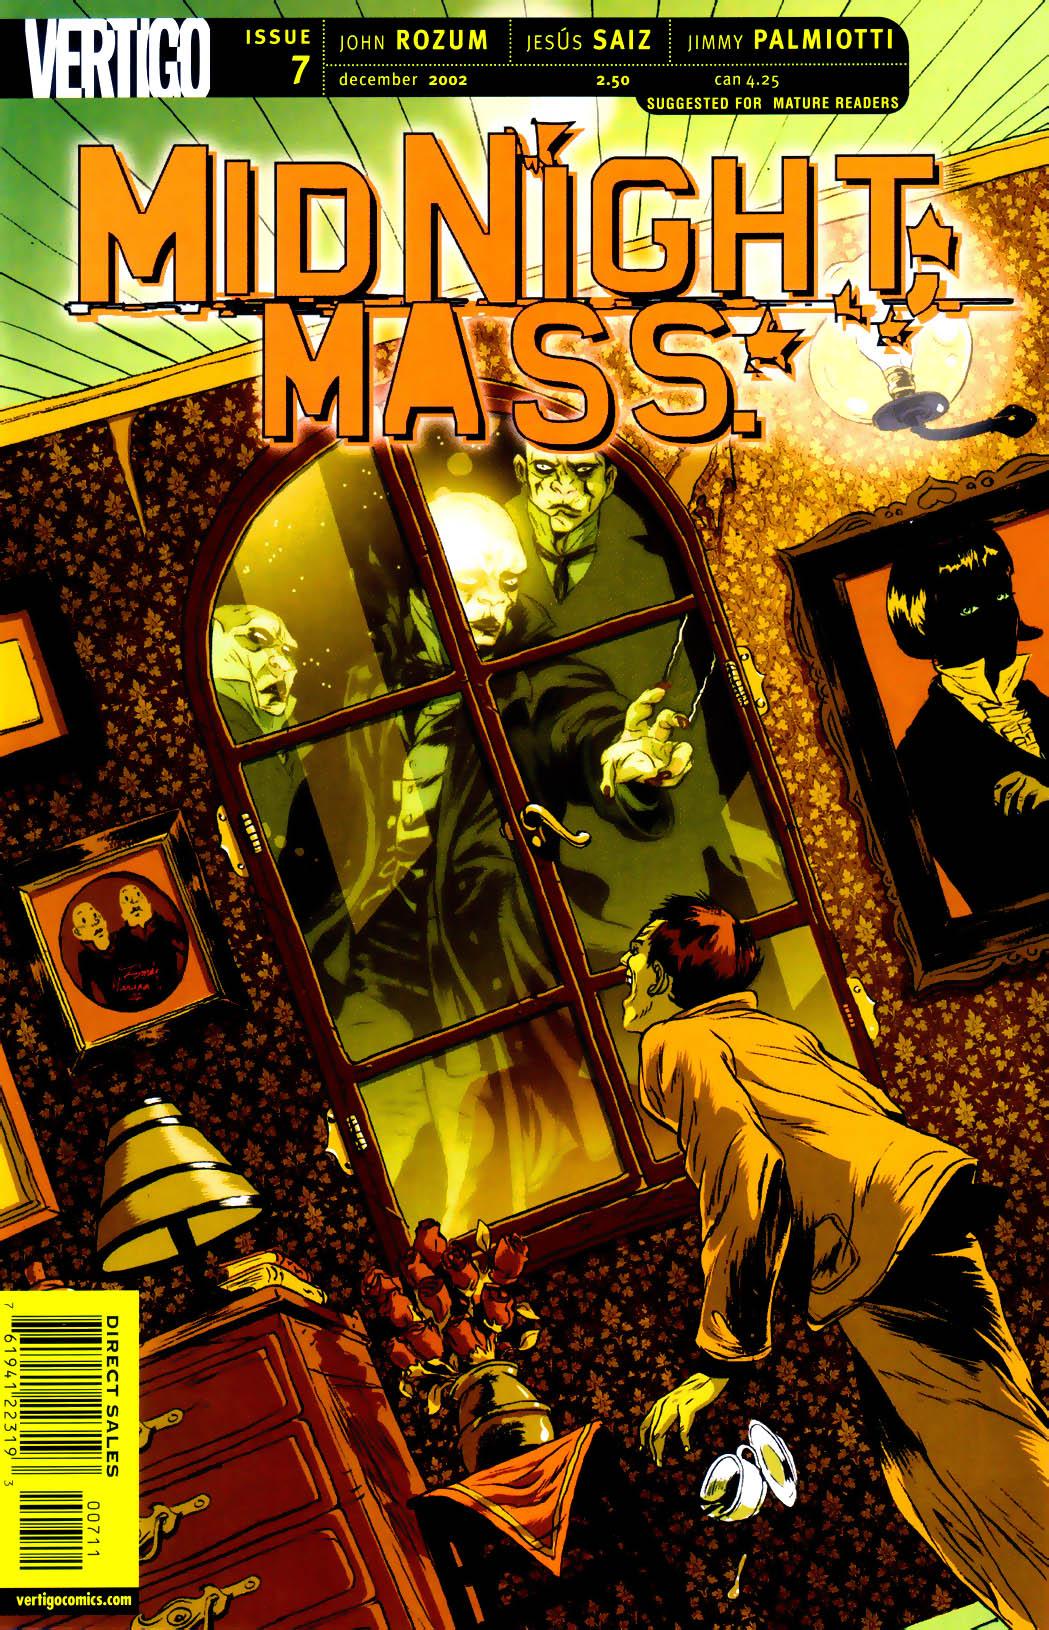 Read online Midnight, Mass comic -  Issue #7 - 1